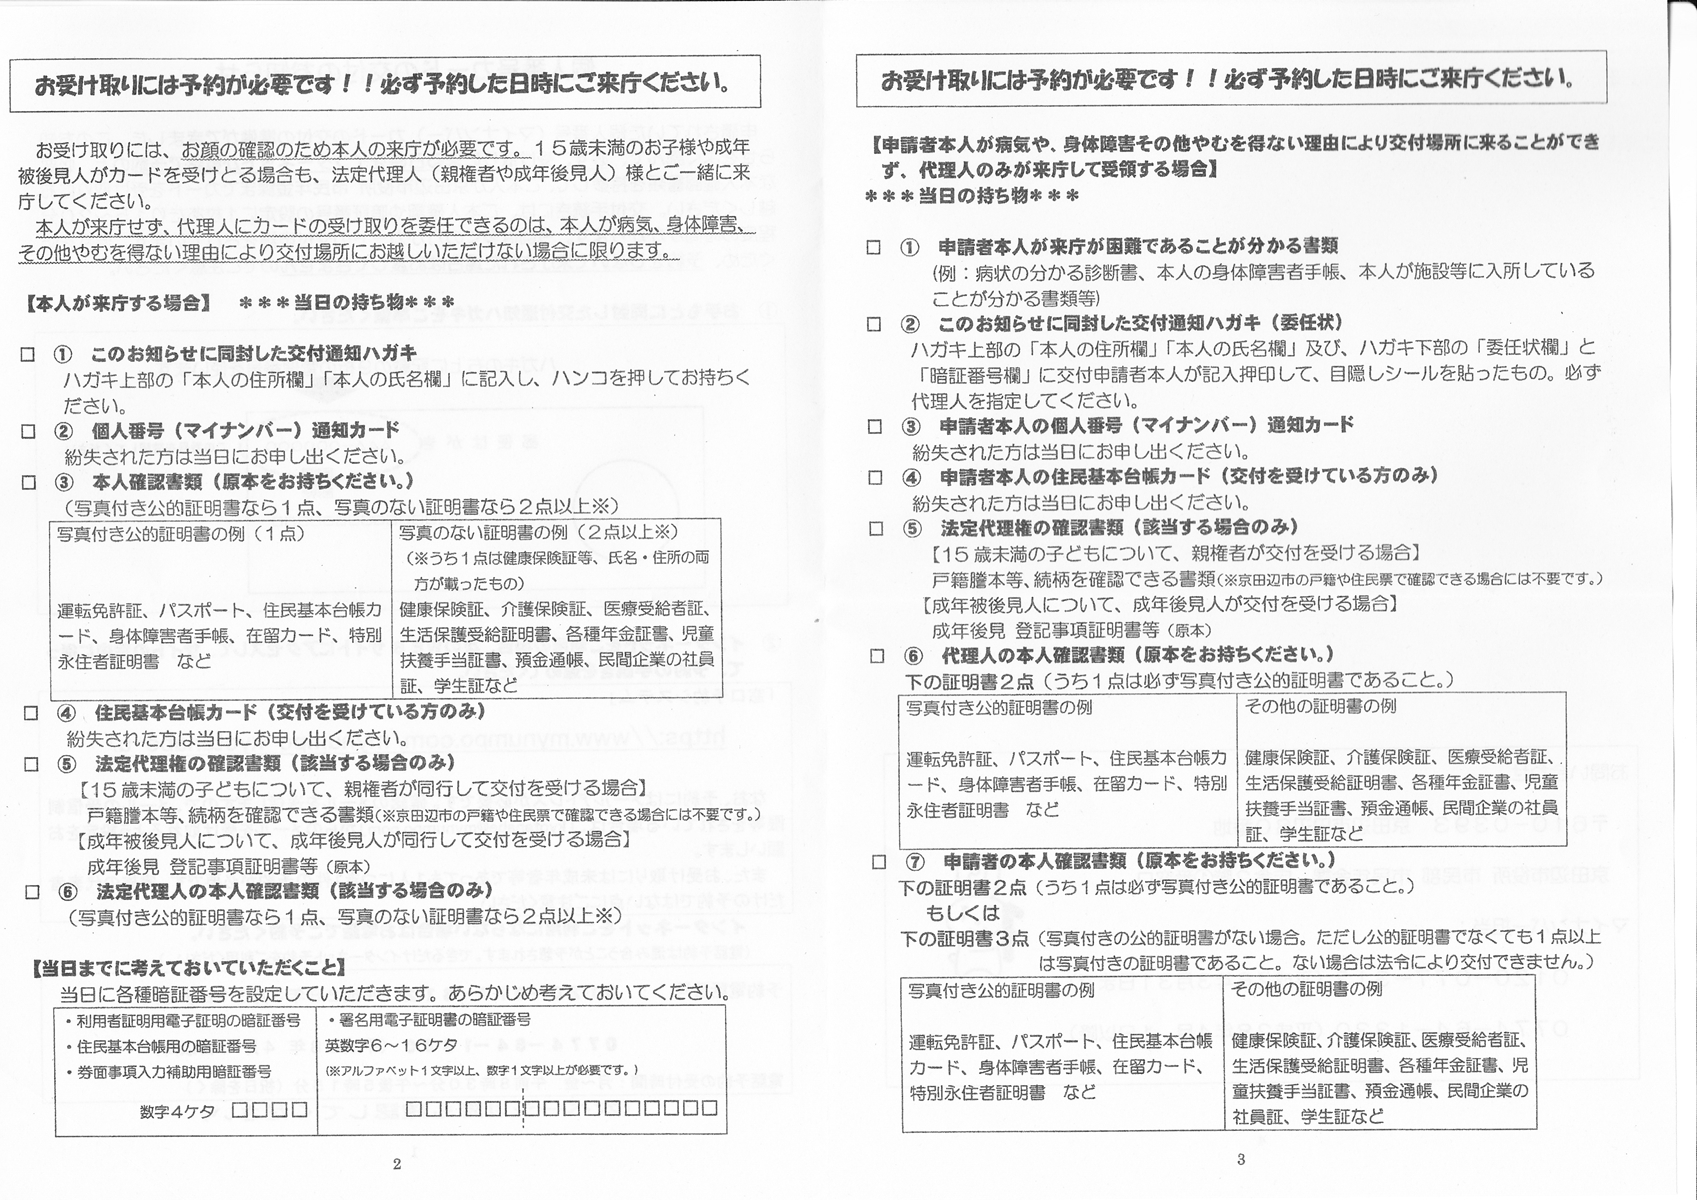 mynumbercard_oshirase2m.jpg